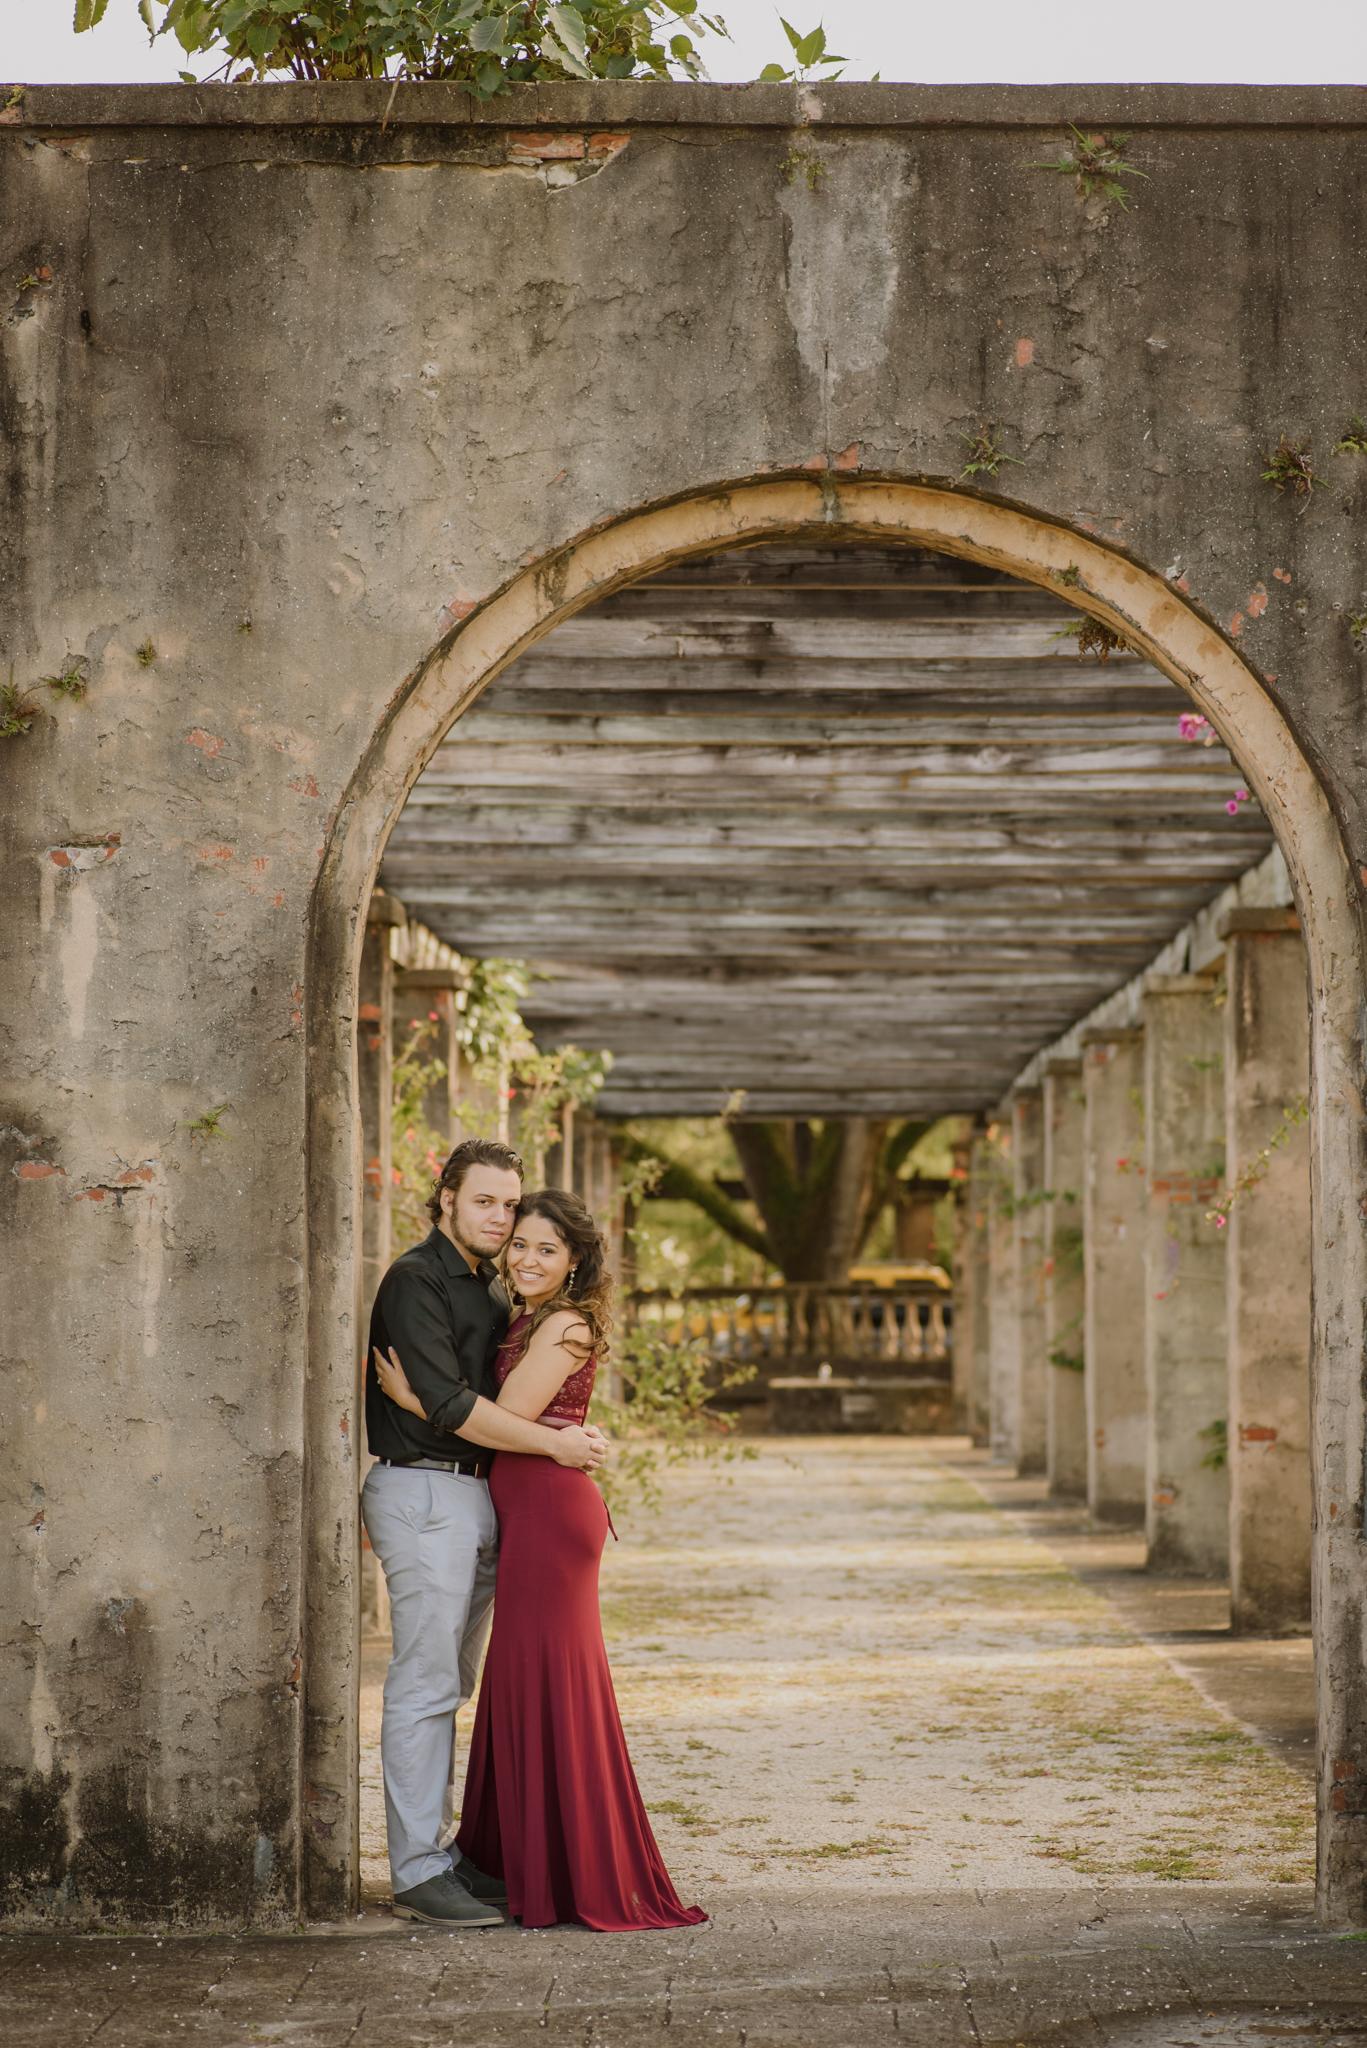 biltmore-wedding-engagement-vanessa-and-johnny-photography-video-1-6.jpg